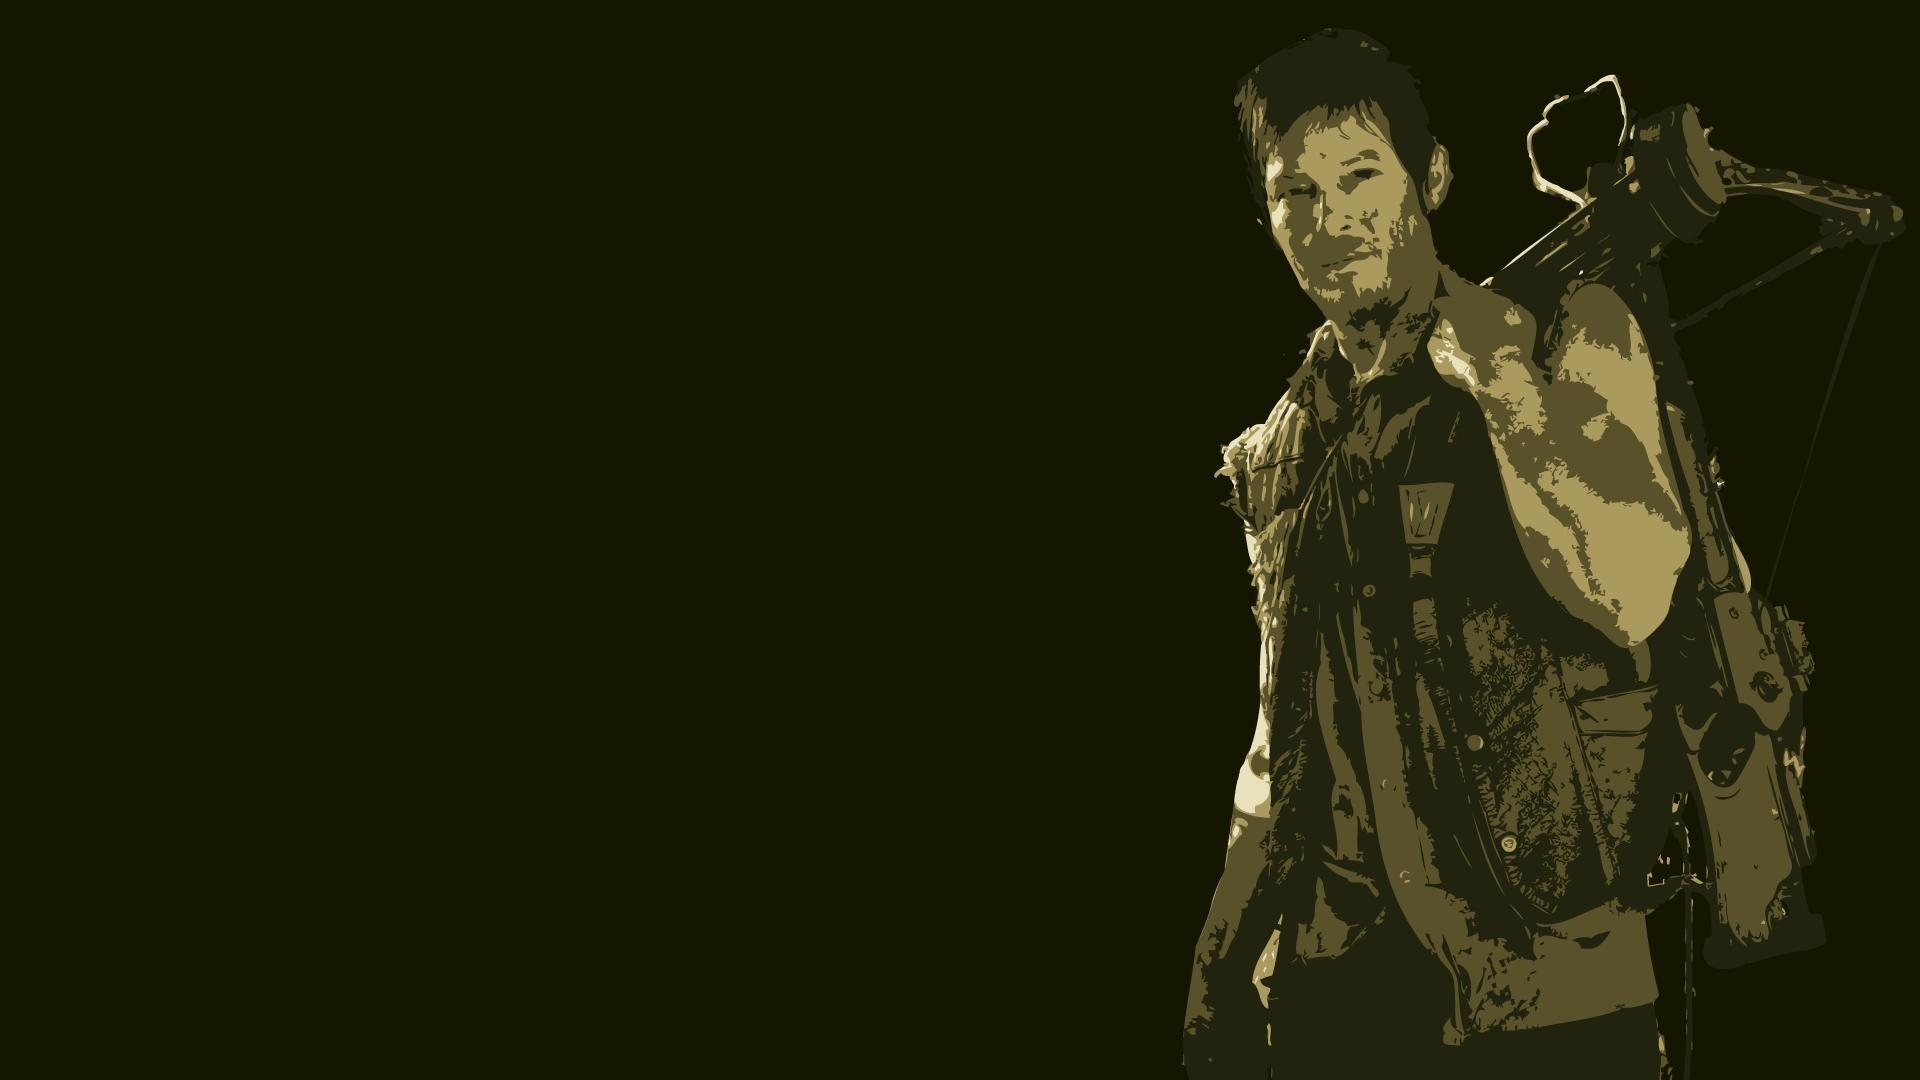 Daryl Dixon Wallpapers (54+ Images